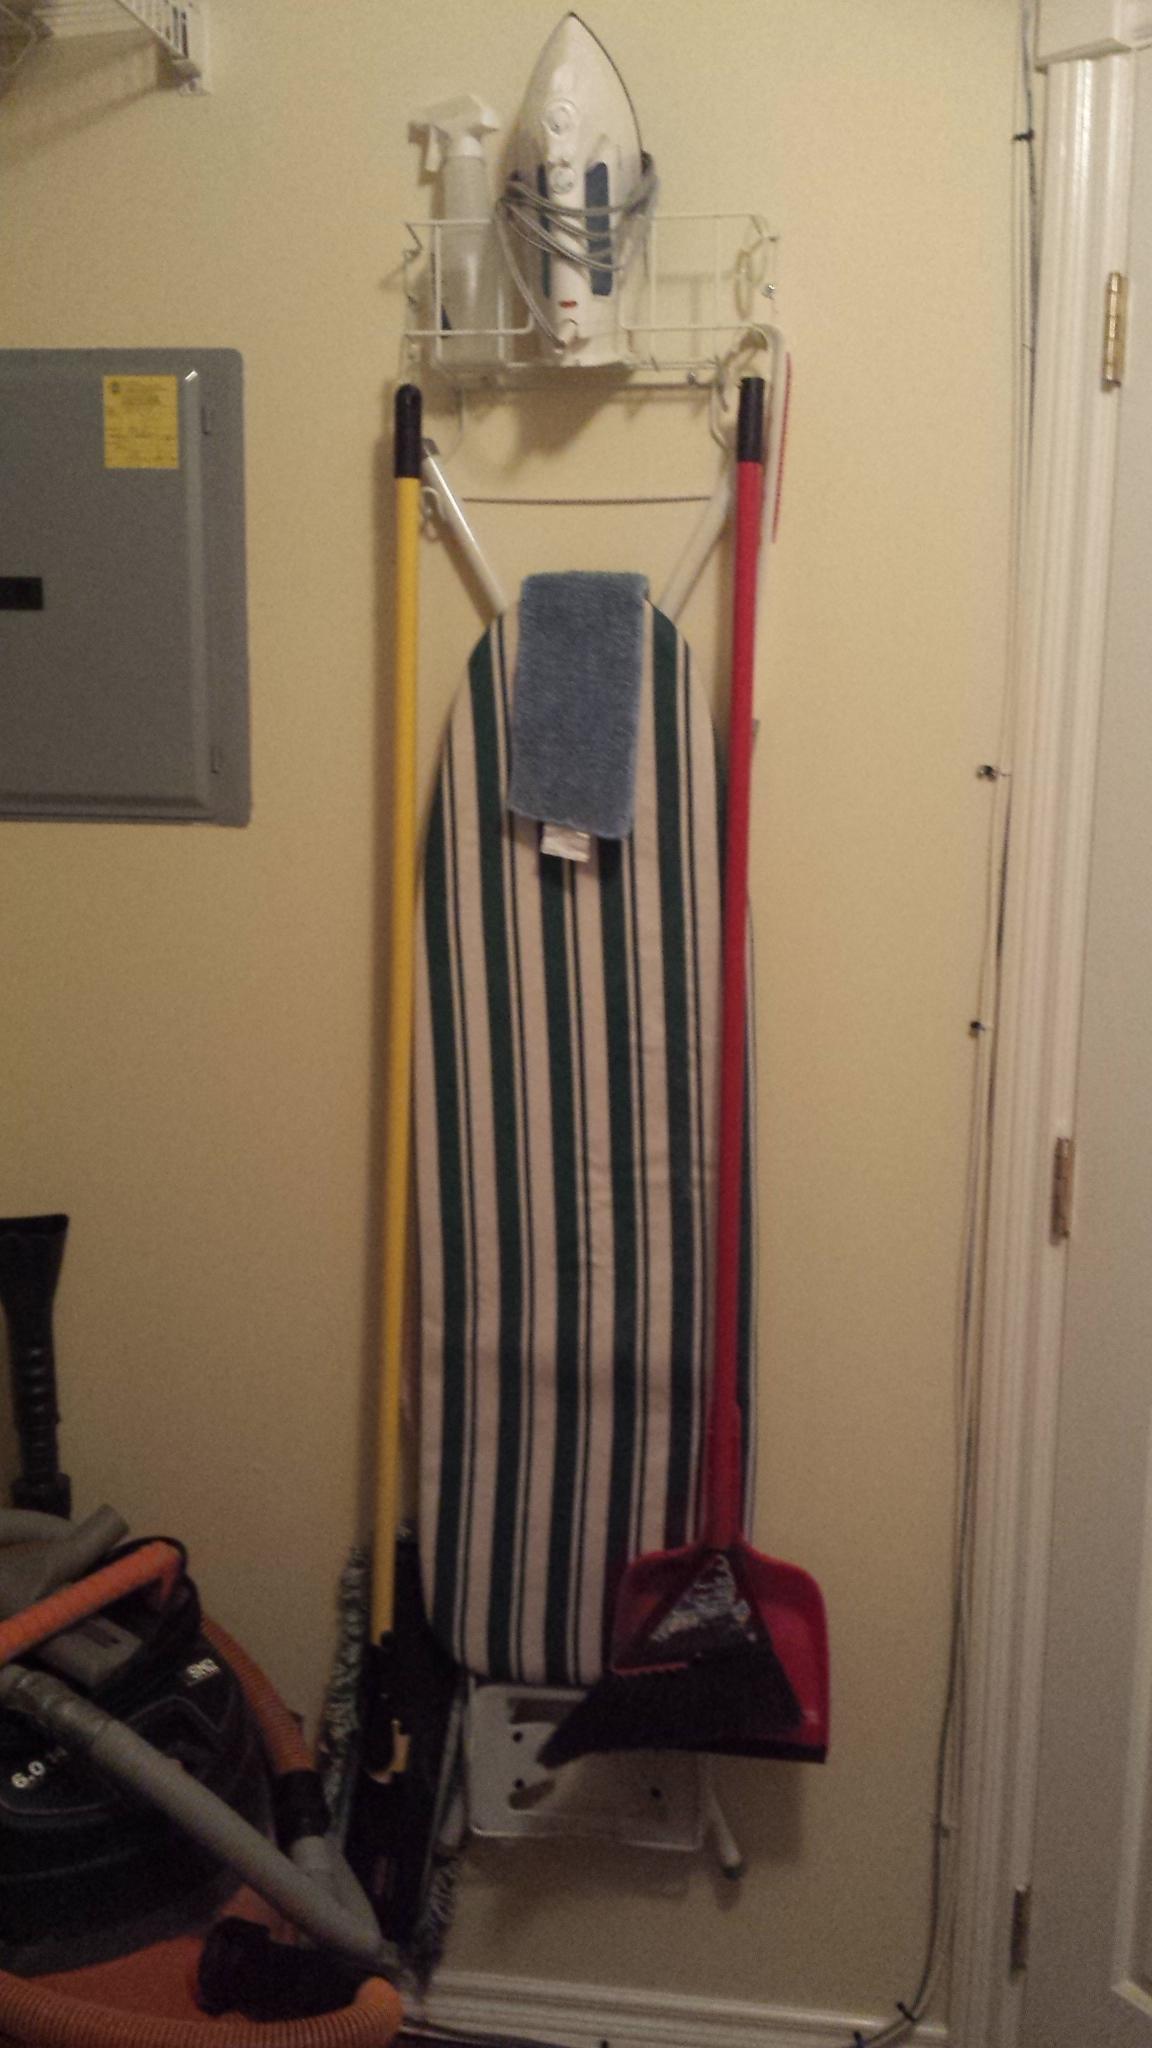 Unit 204 - Laundry Room 6